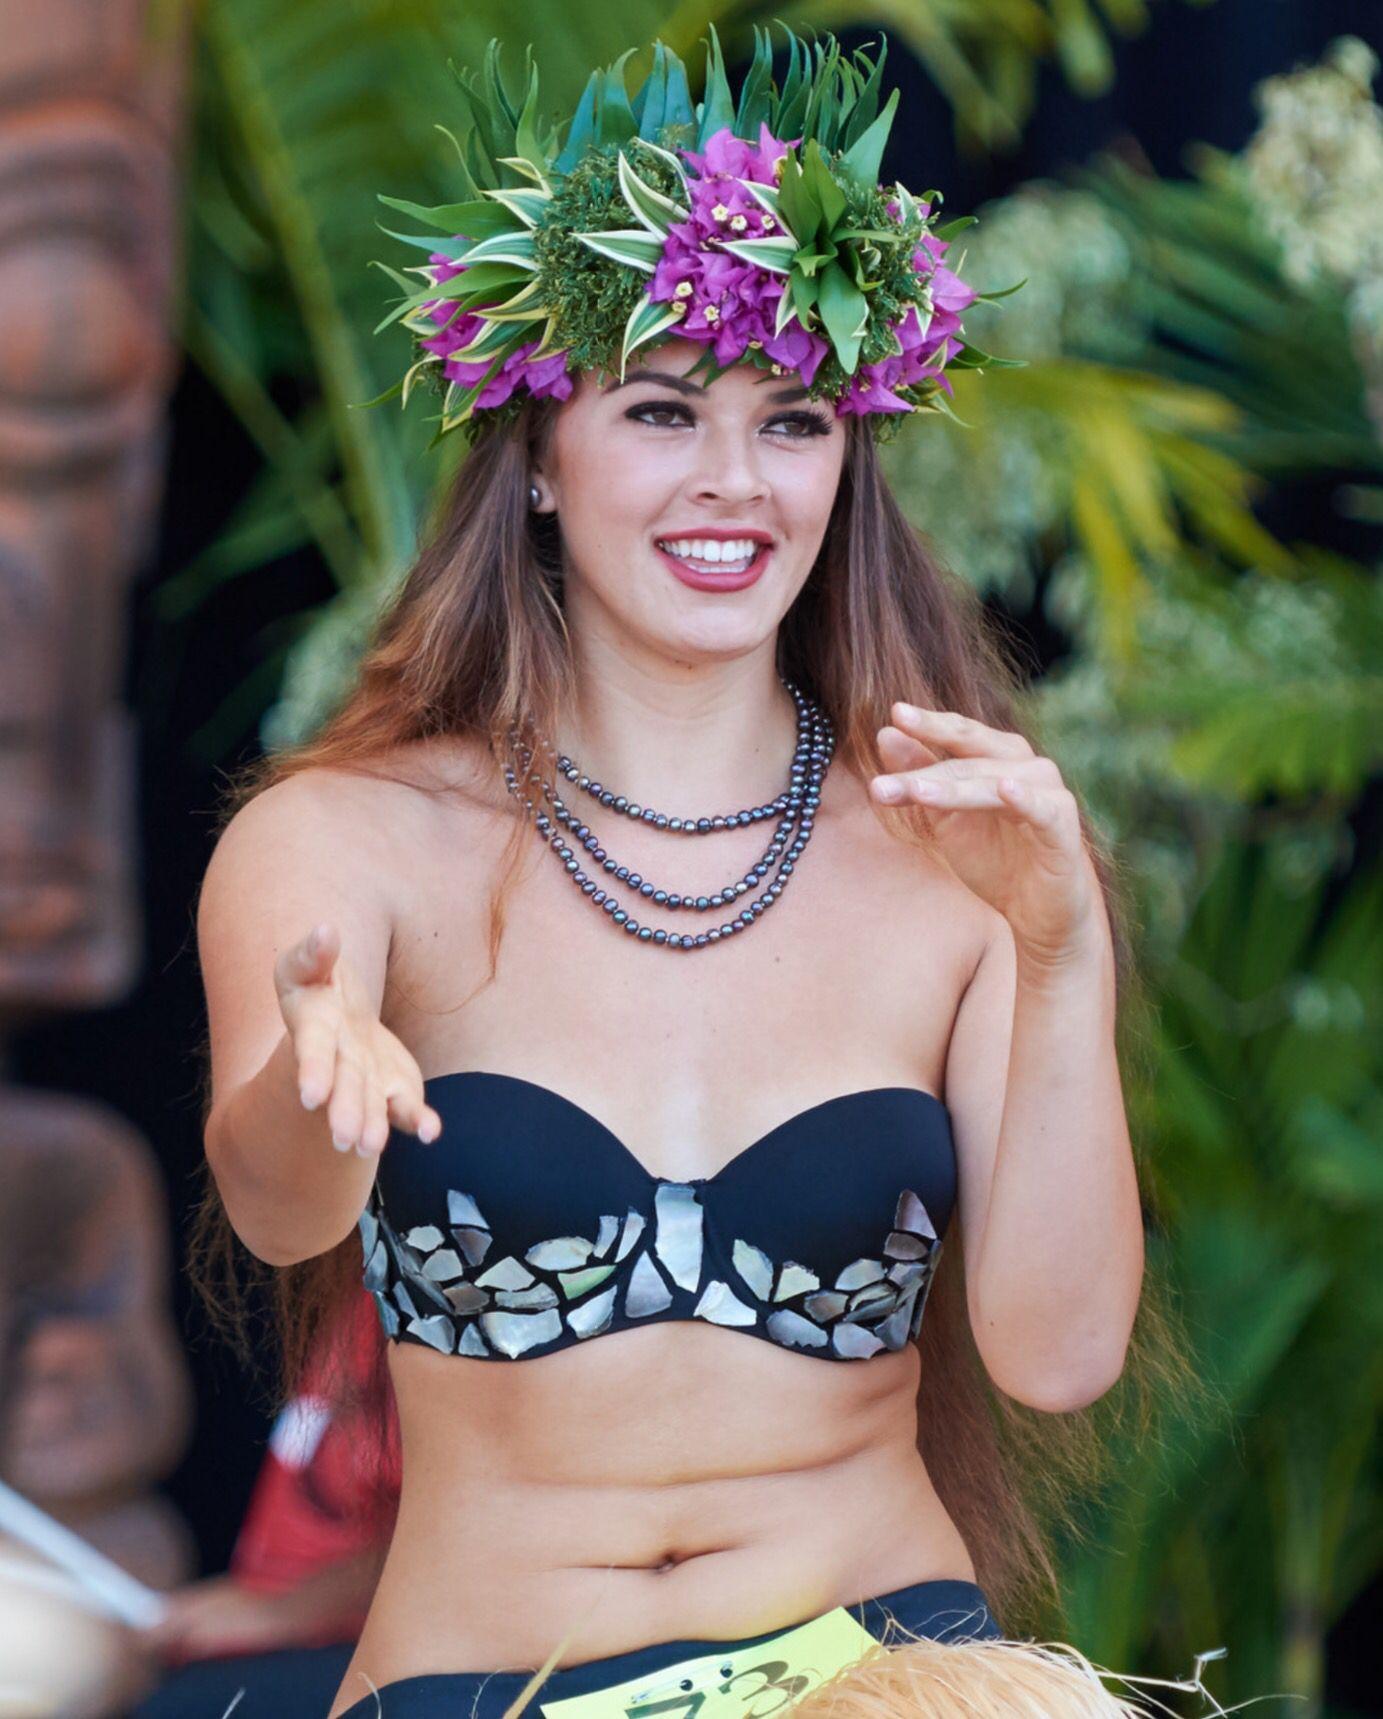 Hawaiian sexporn, real young naked girl movie